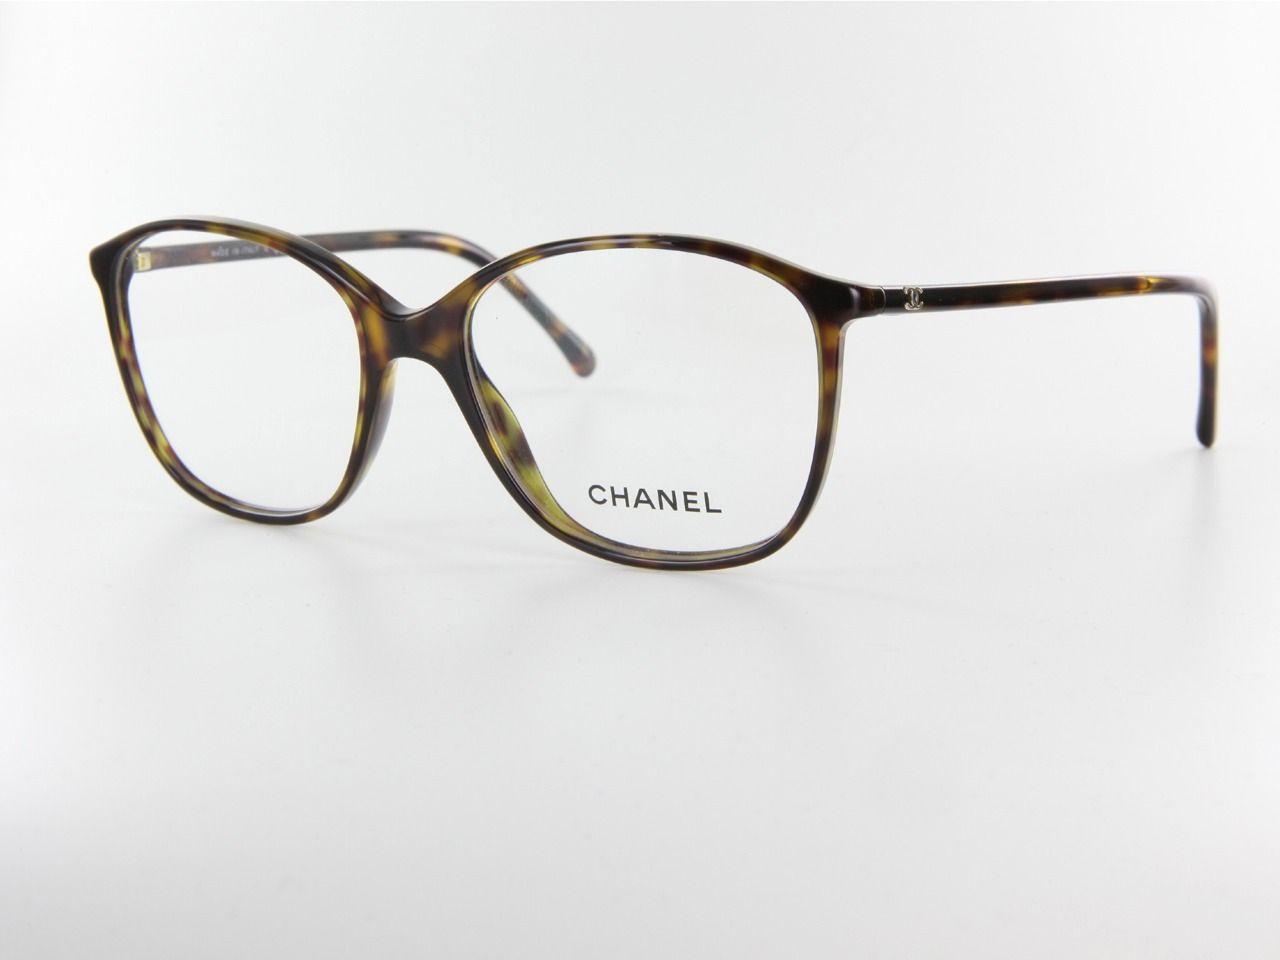 Frame for glasses chanel - Chanel Brillen Chanel Monturen Chanel Eyewear Gent Brugge